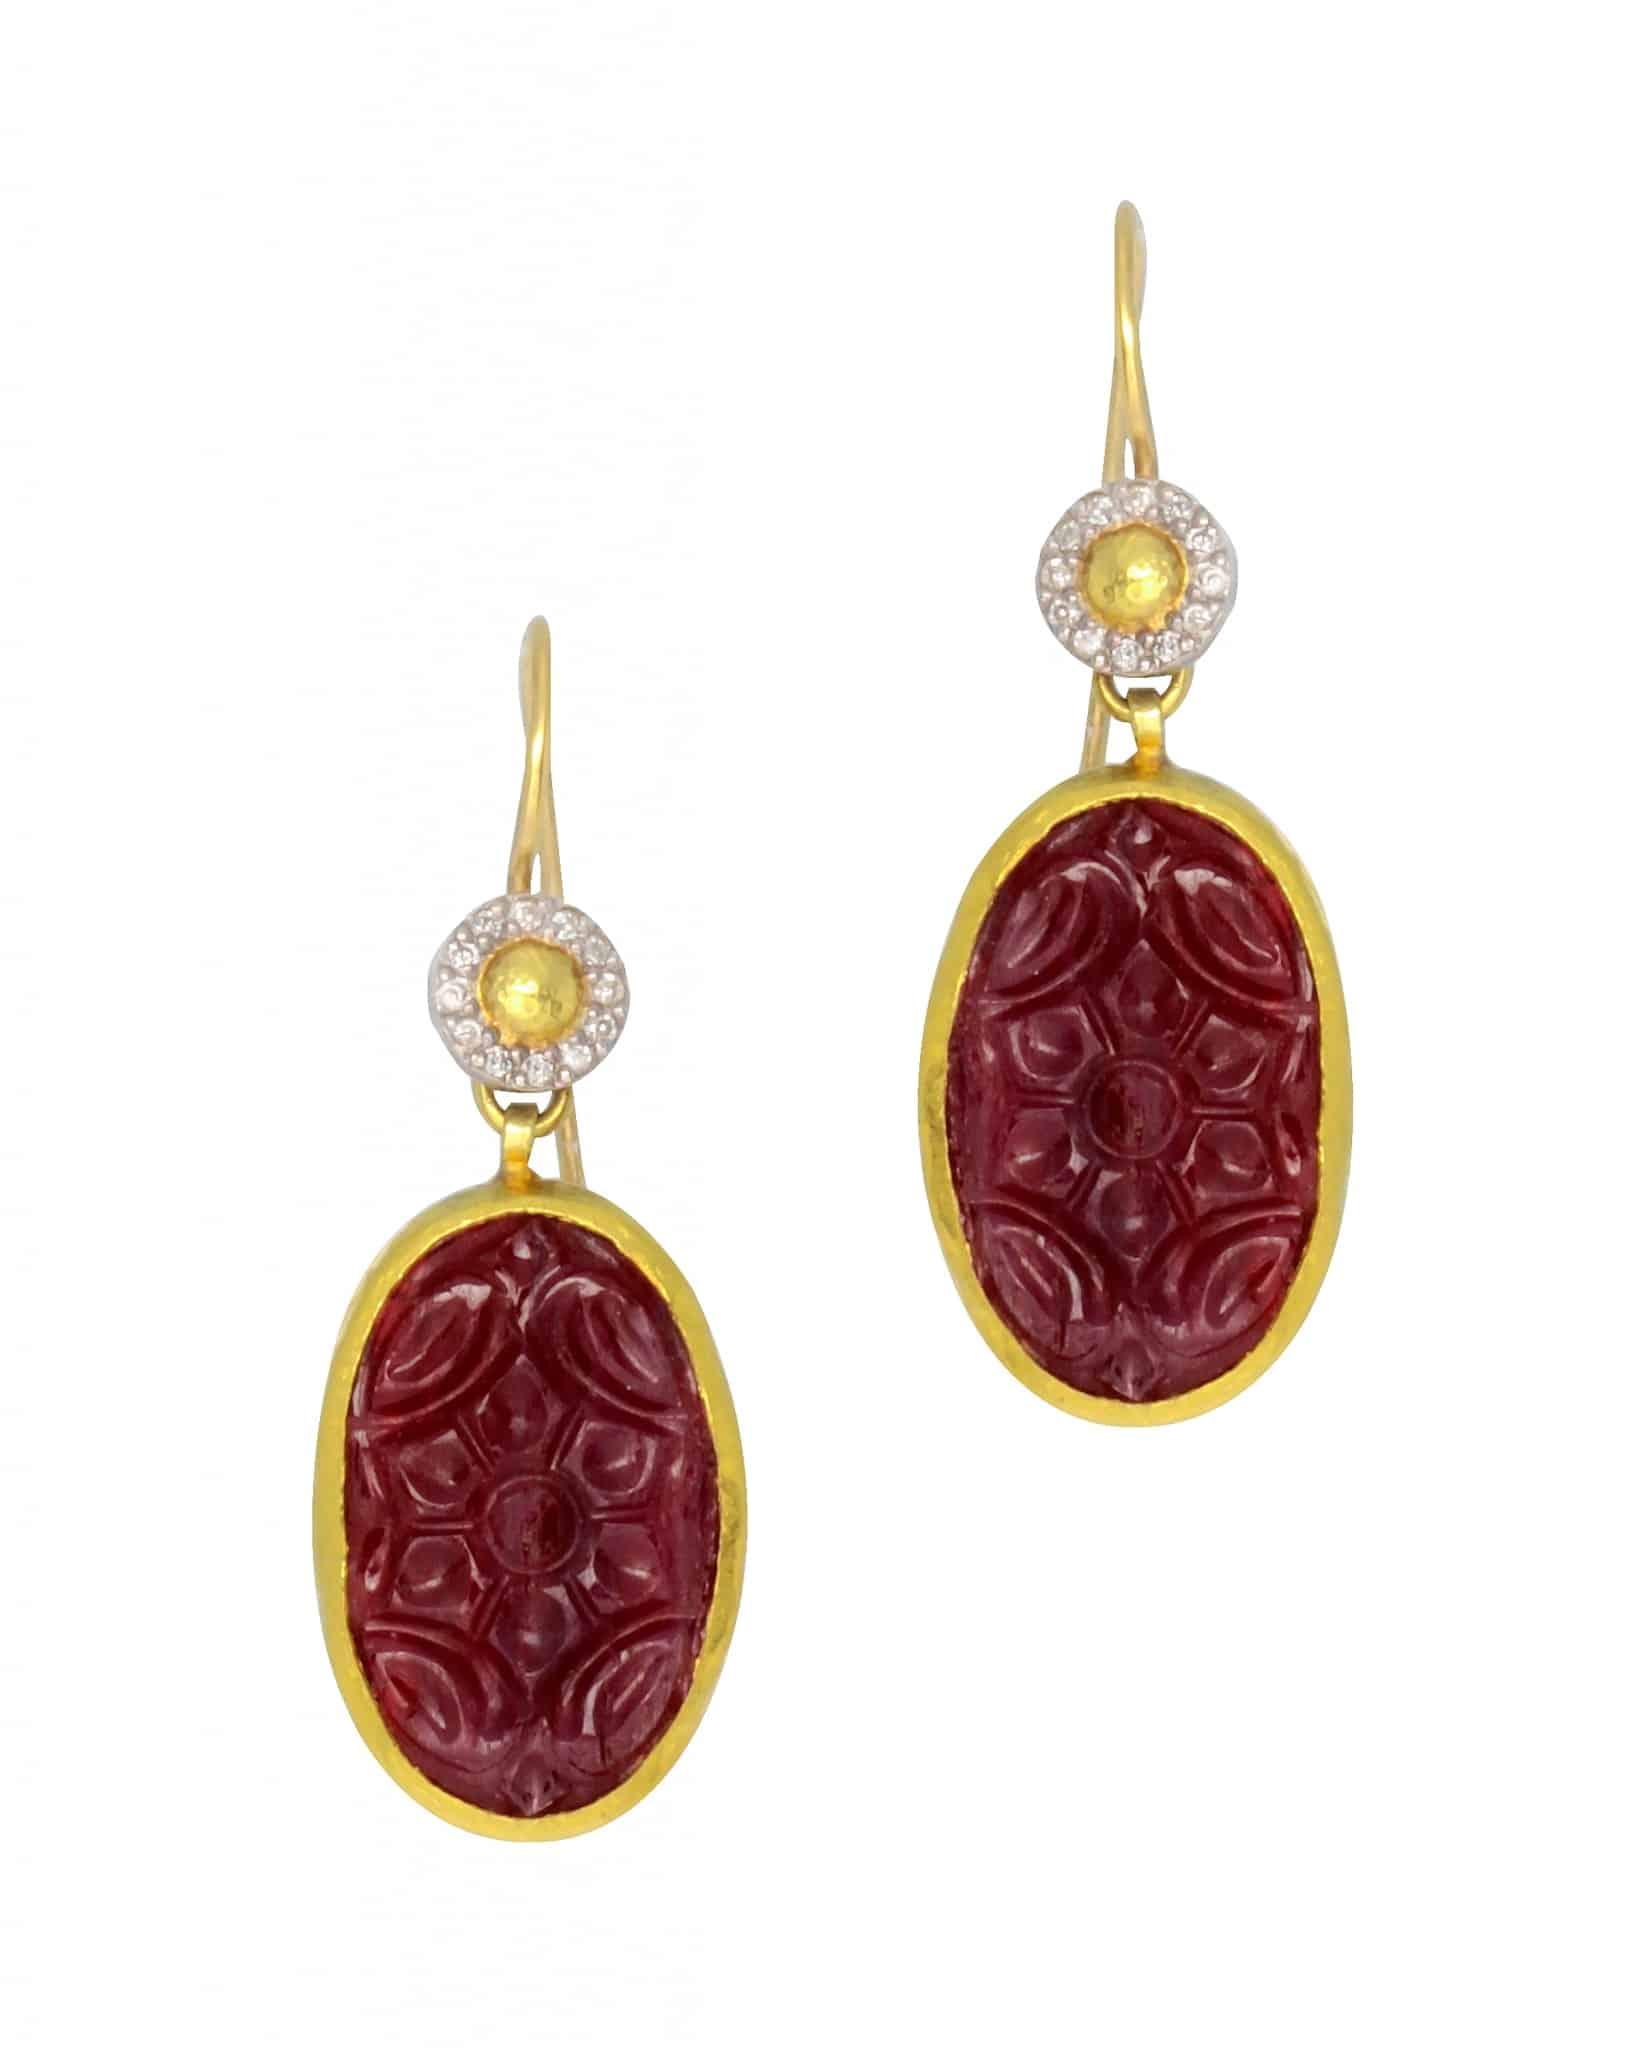 GURHAN – One of a Kind Aurora drop earrings in 24K gold E-U17465-RU